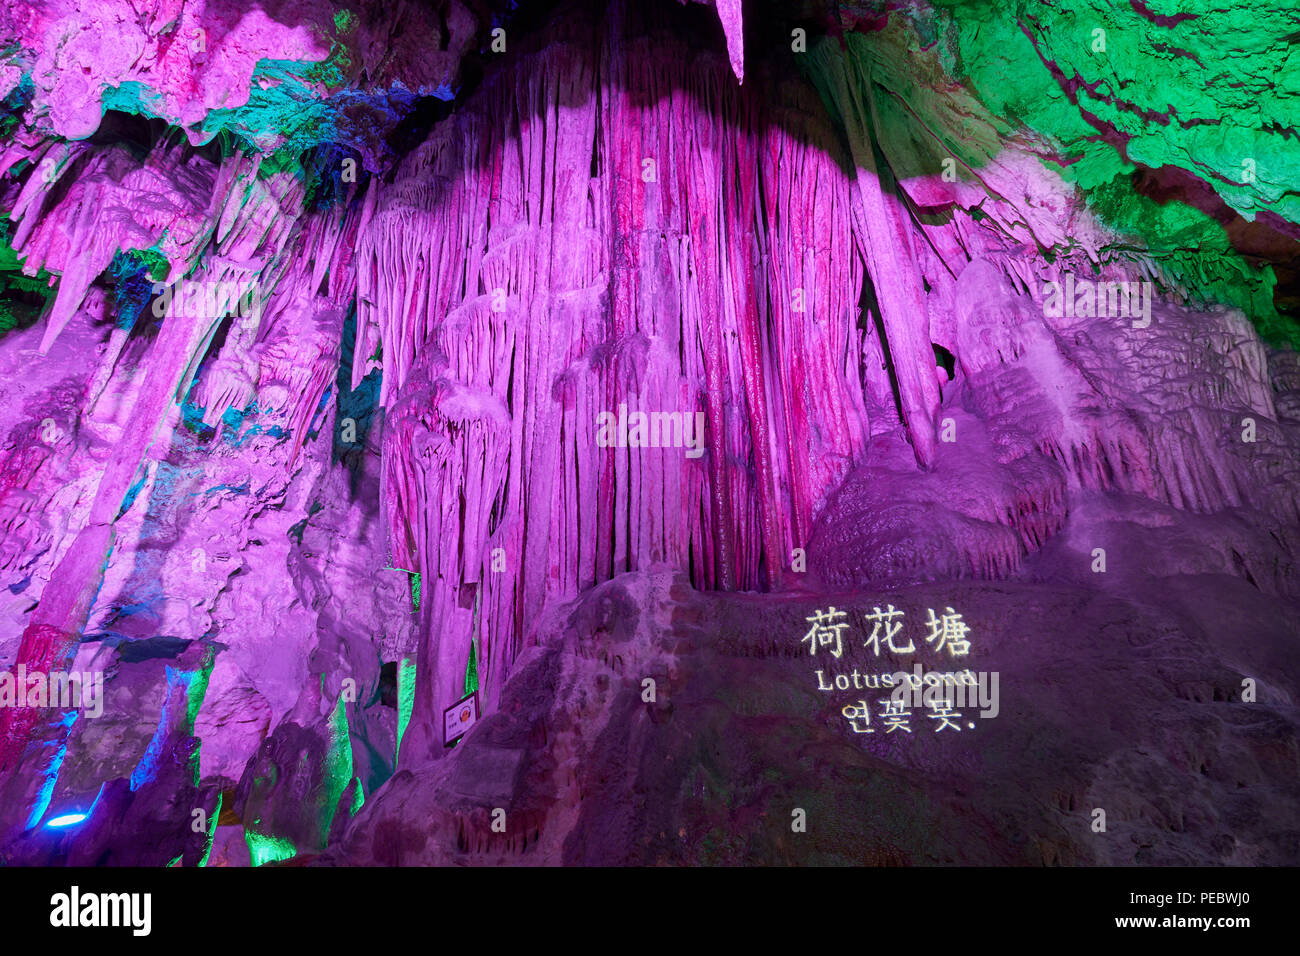 Lotus Pond, Illuminated Karst Cave, Zhashui County, Shaanxi, China Stock Photo